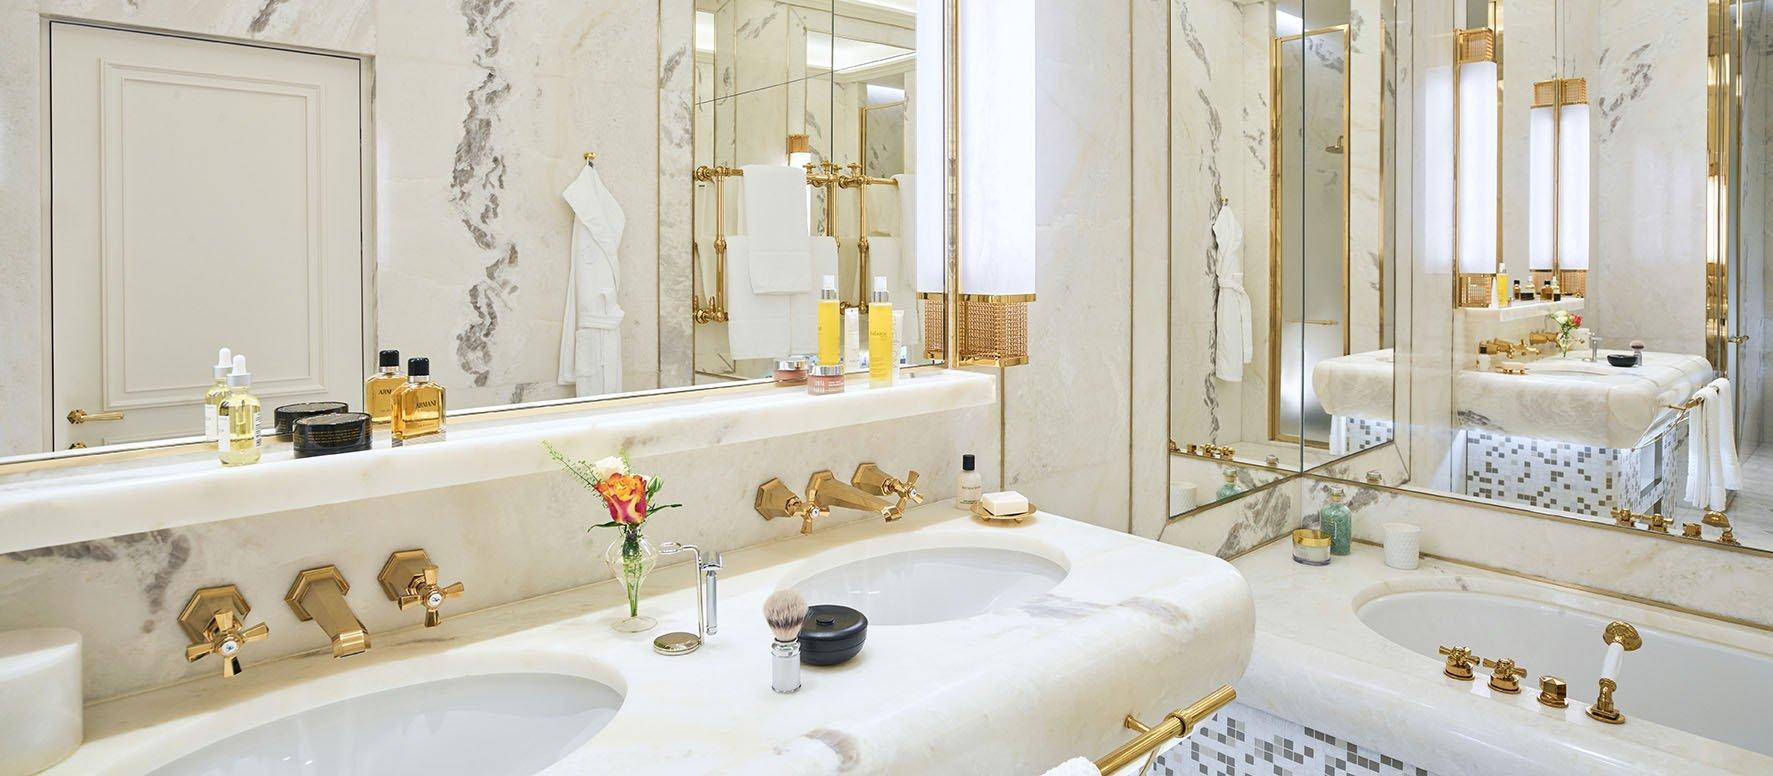 Bathroom inside the Dolce Vita Suite at Hotel Eden